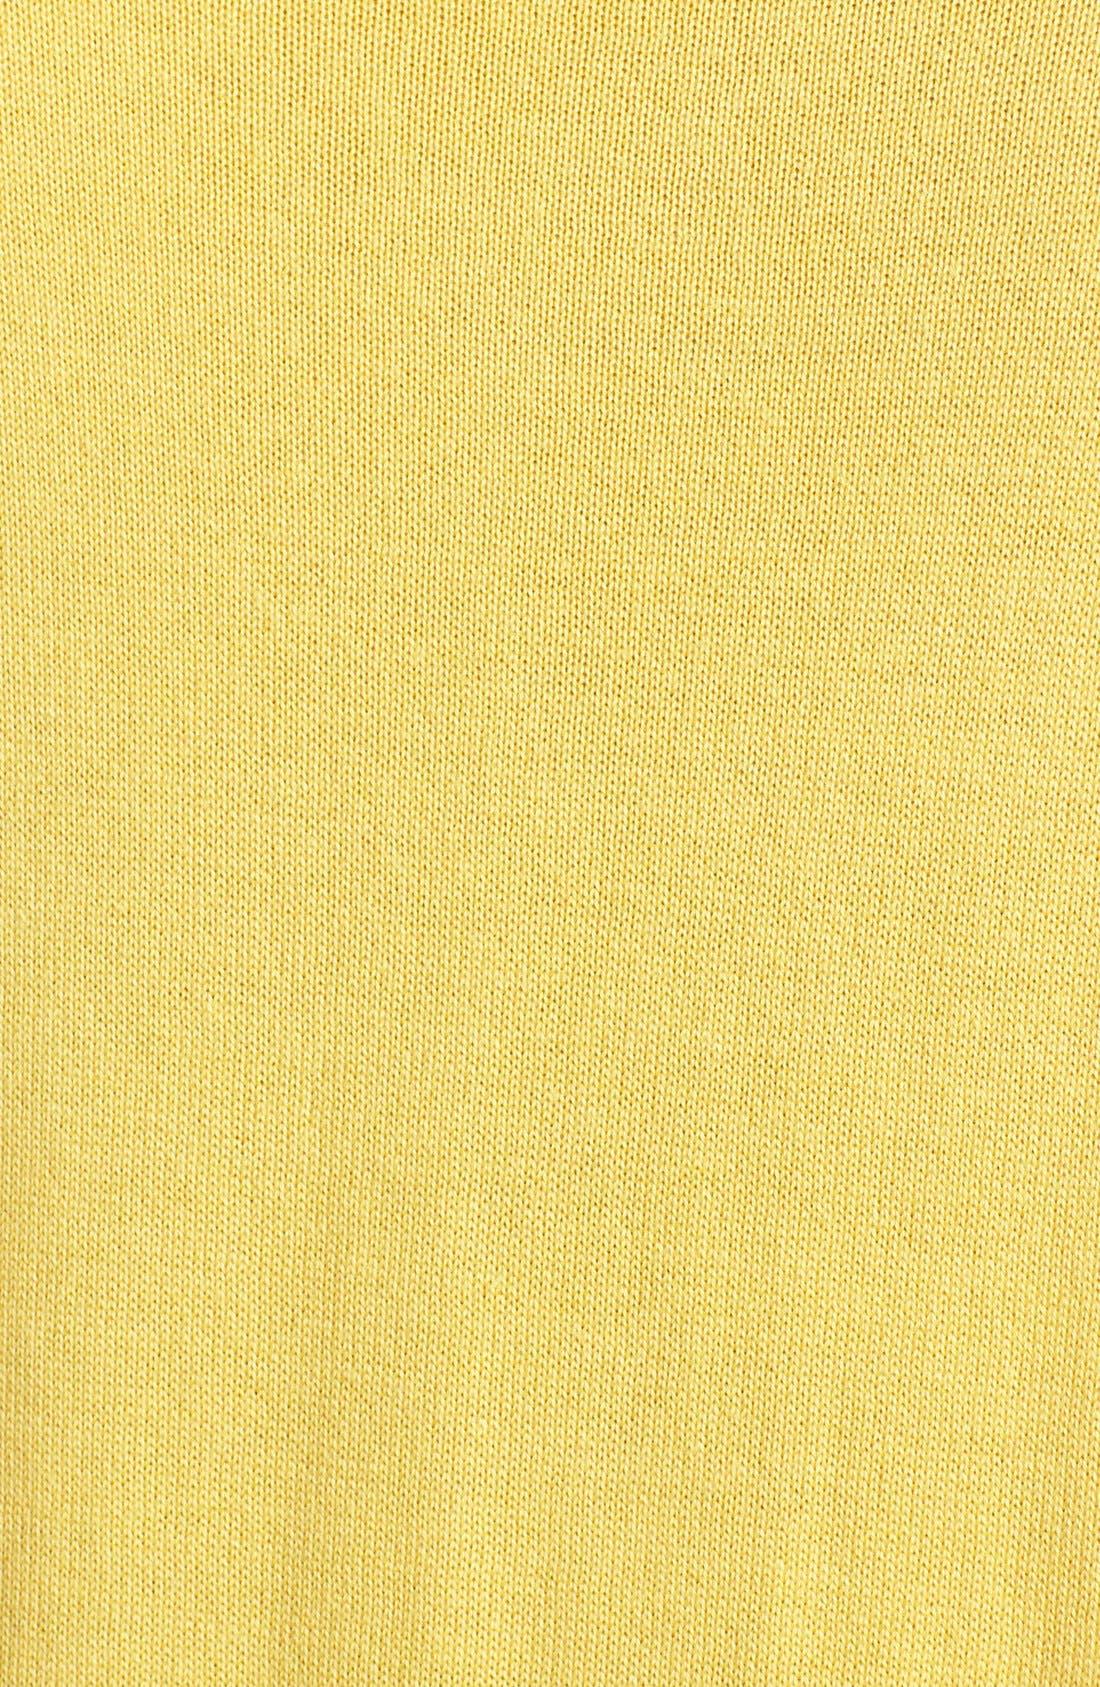 Intarsia Crewneck Sweater,                             Alternate thumbnail 14, color,